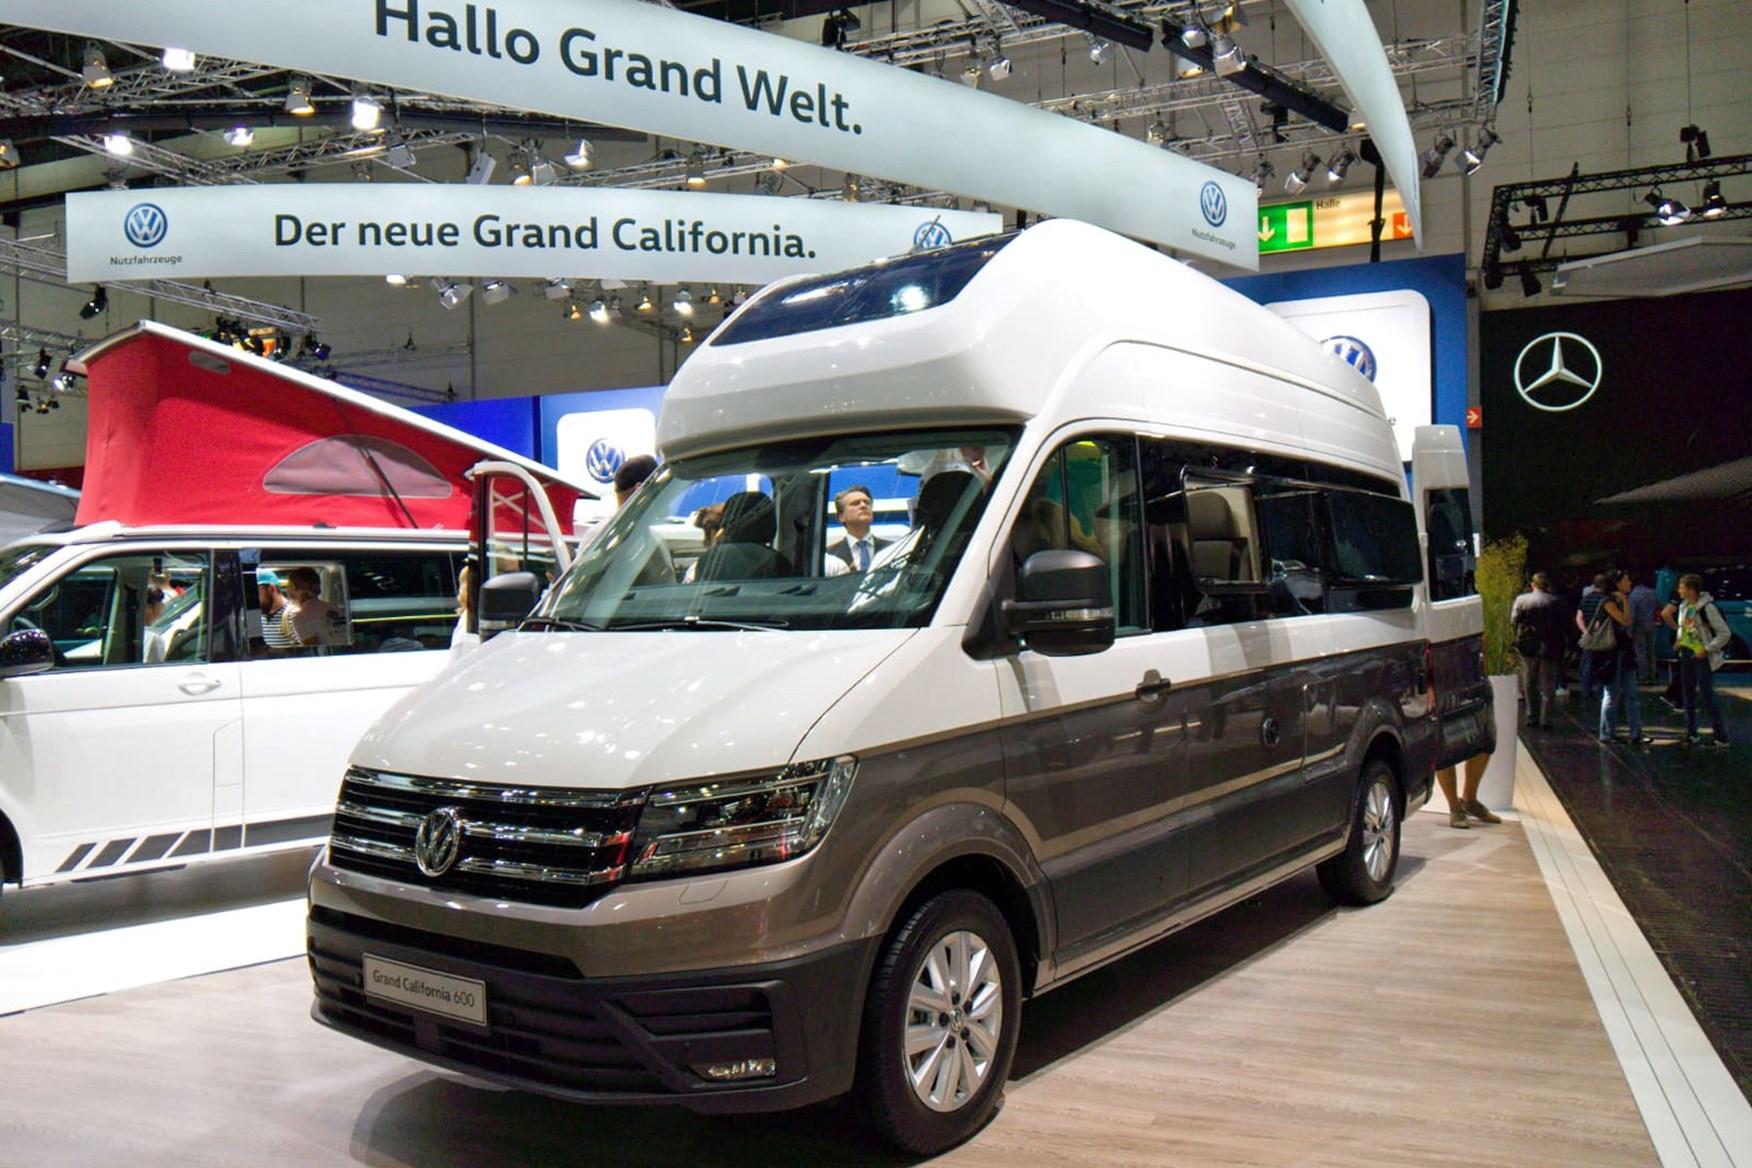 Vw California Xxl For Sale >> Campervan show stars - highlights from 2018 Caravan Salon Dusseldorf | Parkers